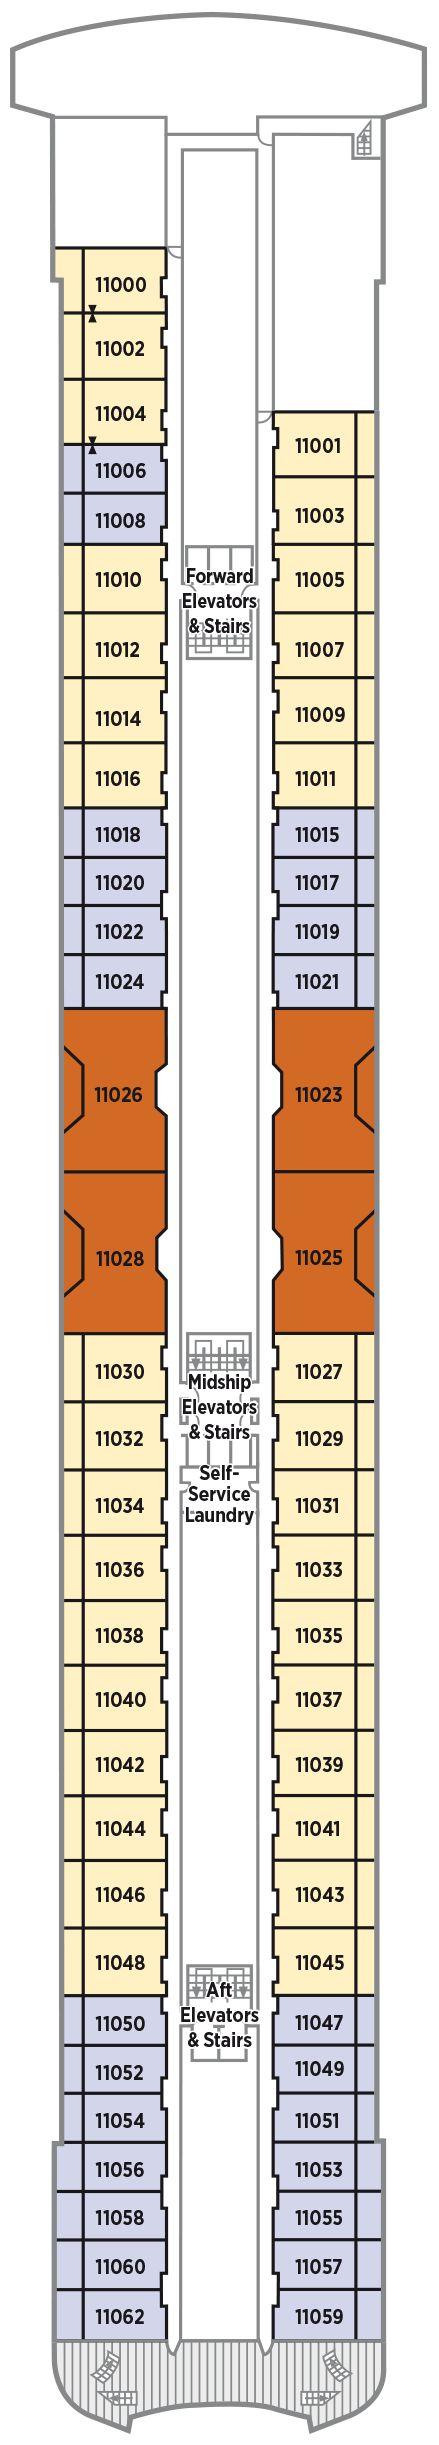 Deck 11 Penthouse Deck